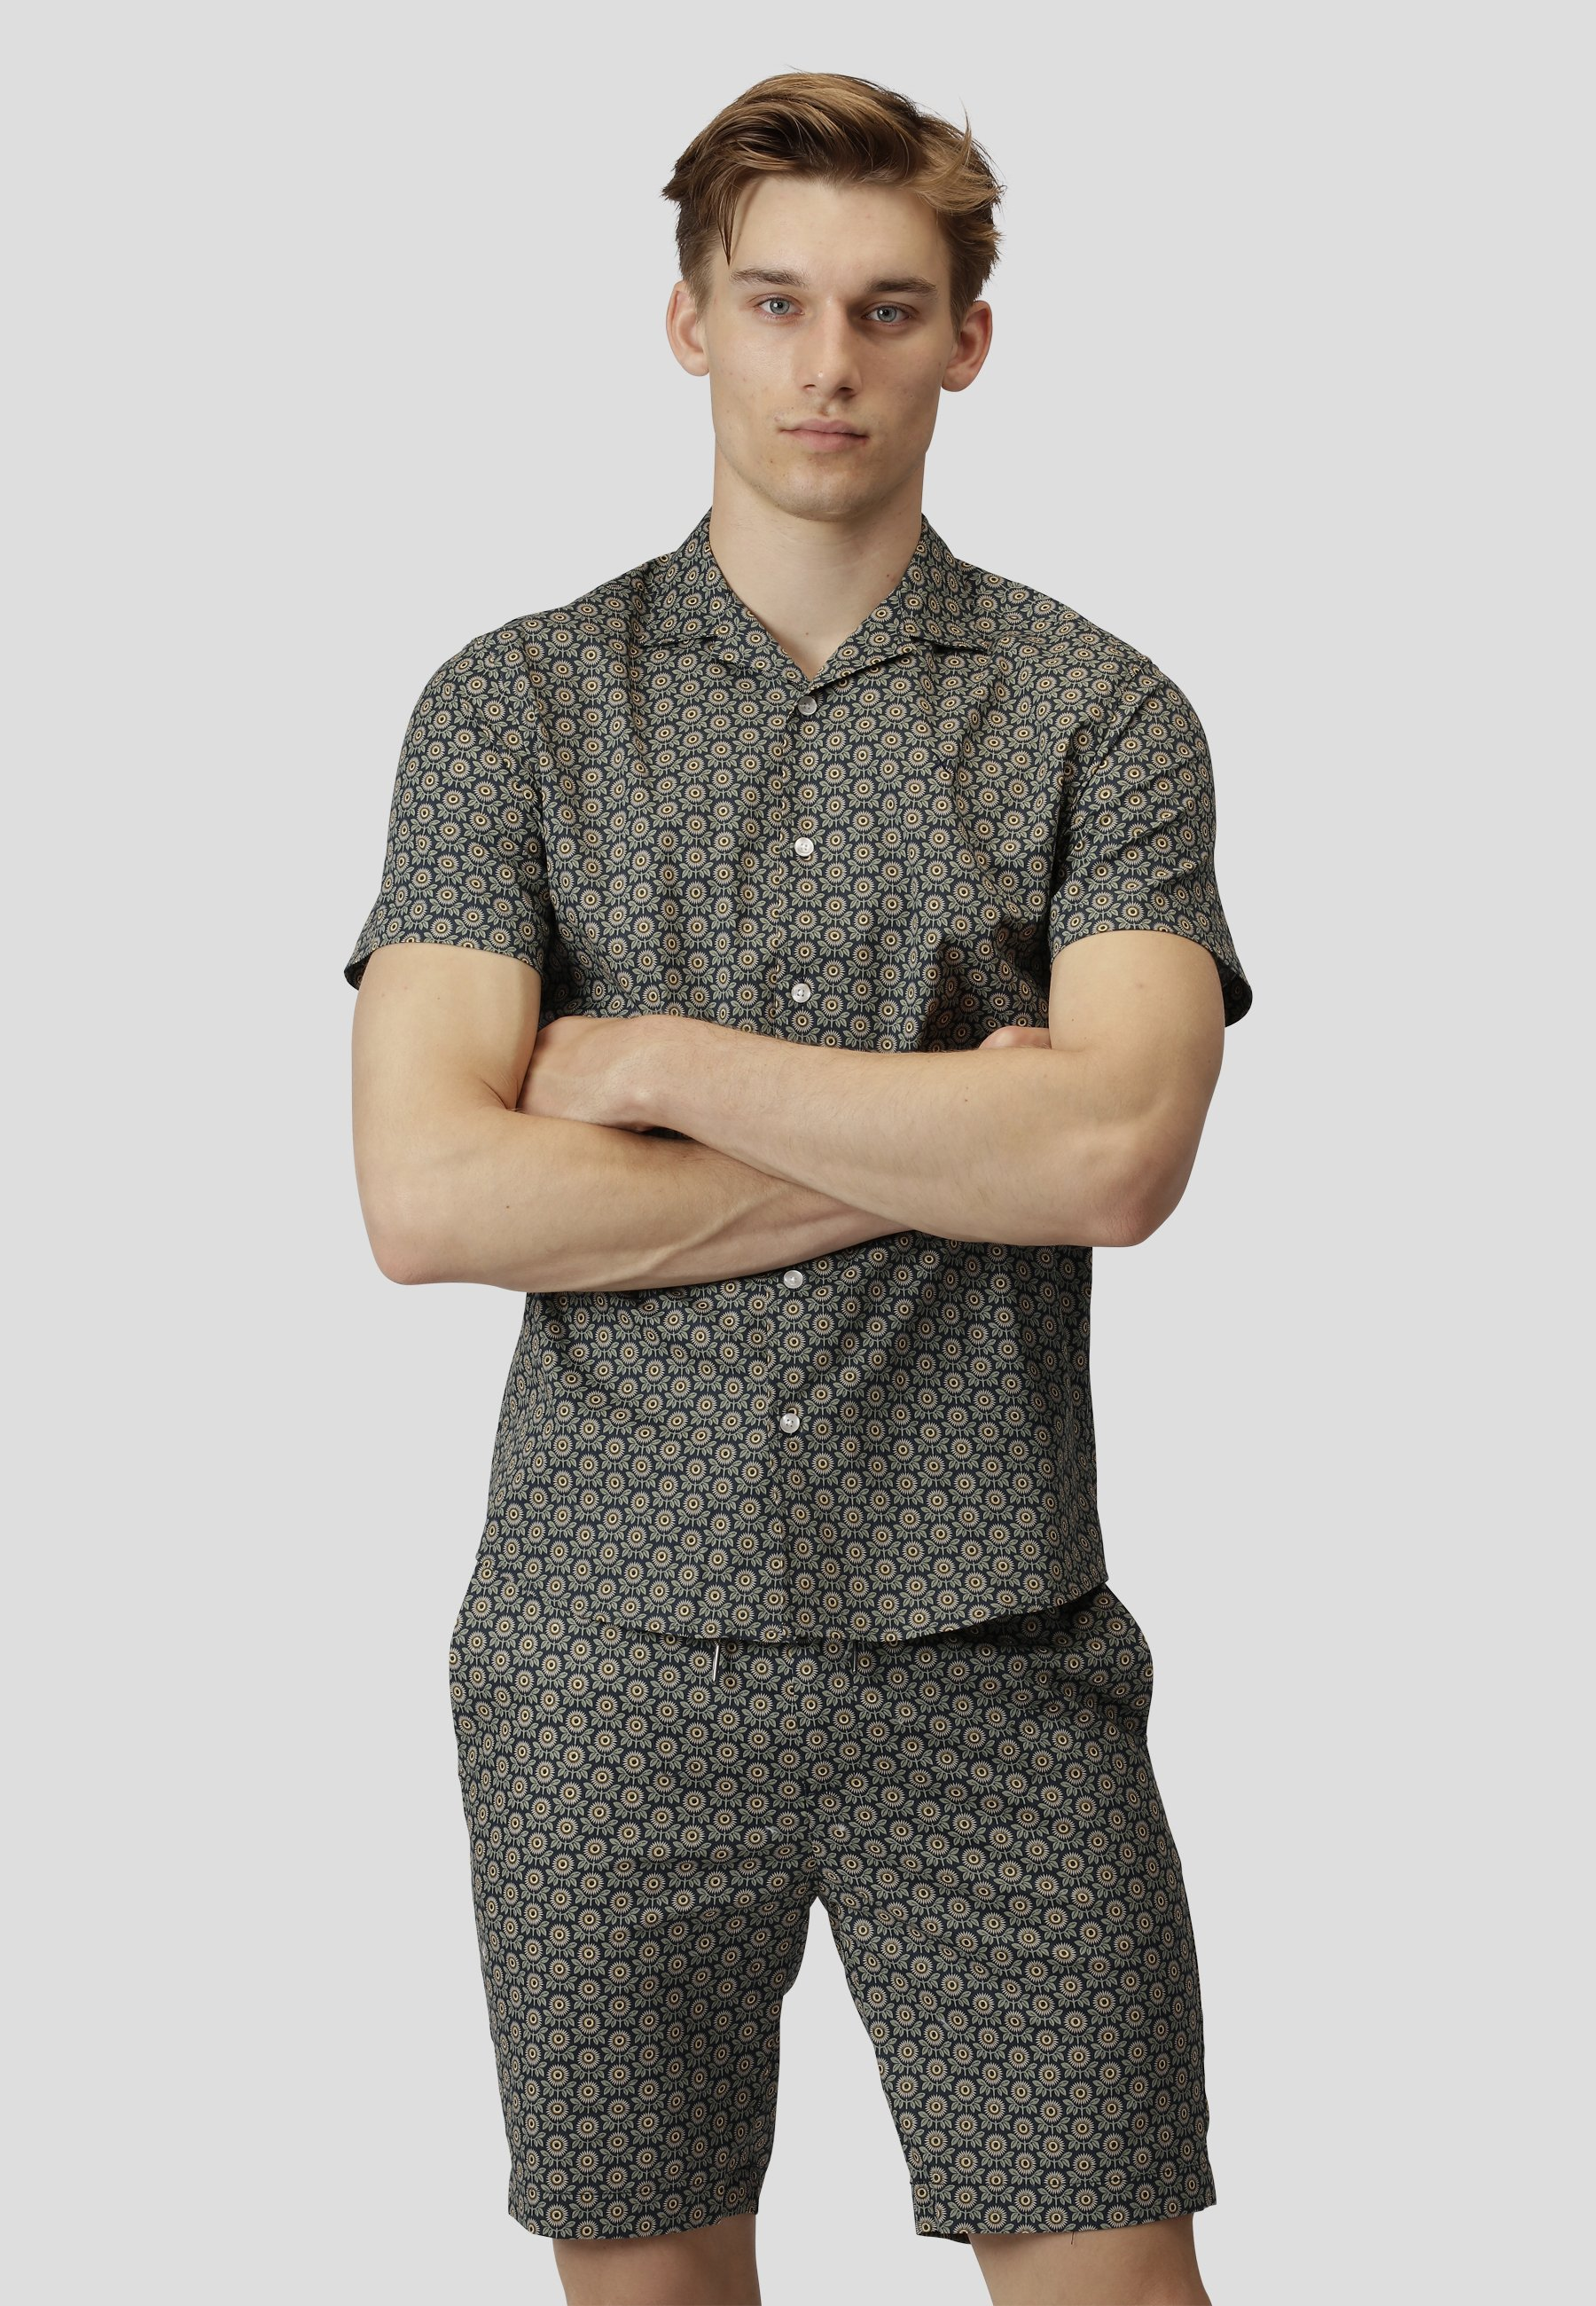 Uomo BOWLING FELIX S/S - Camicia